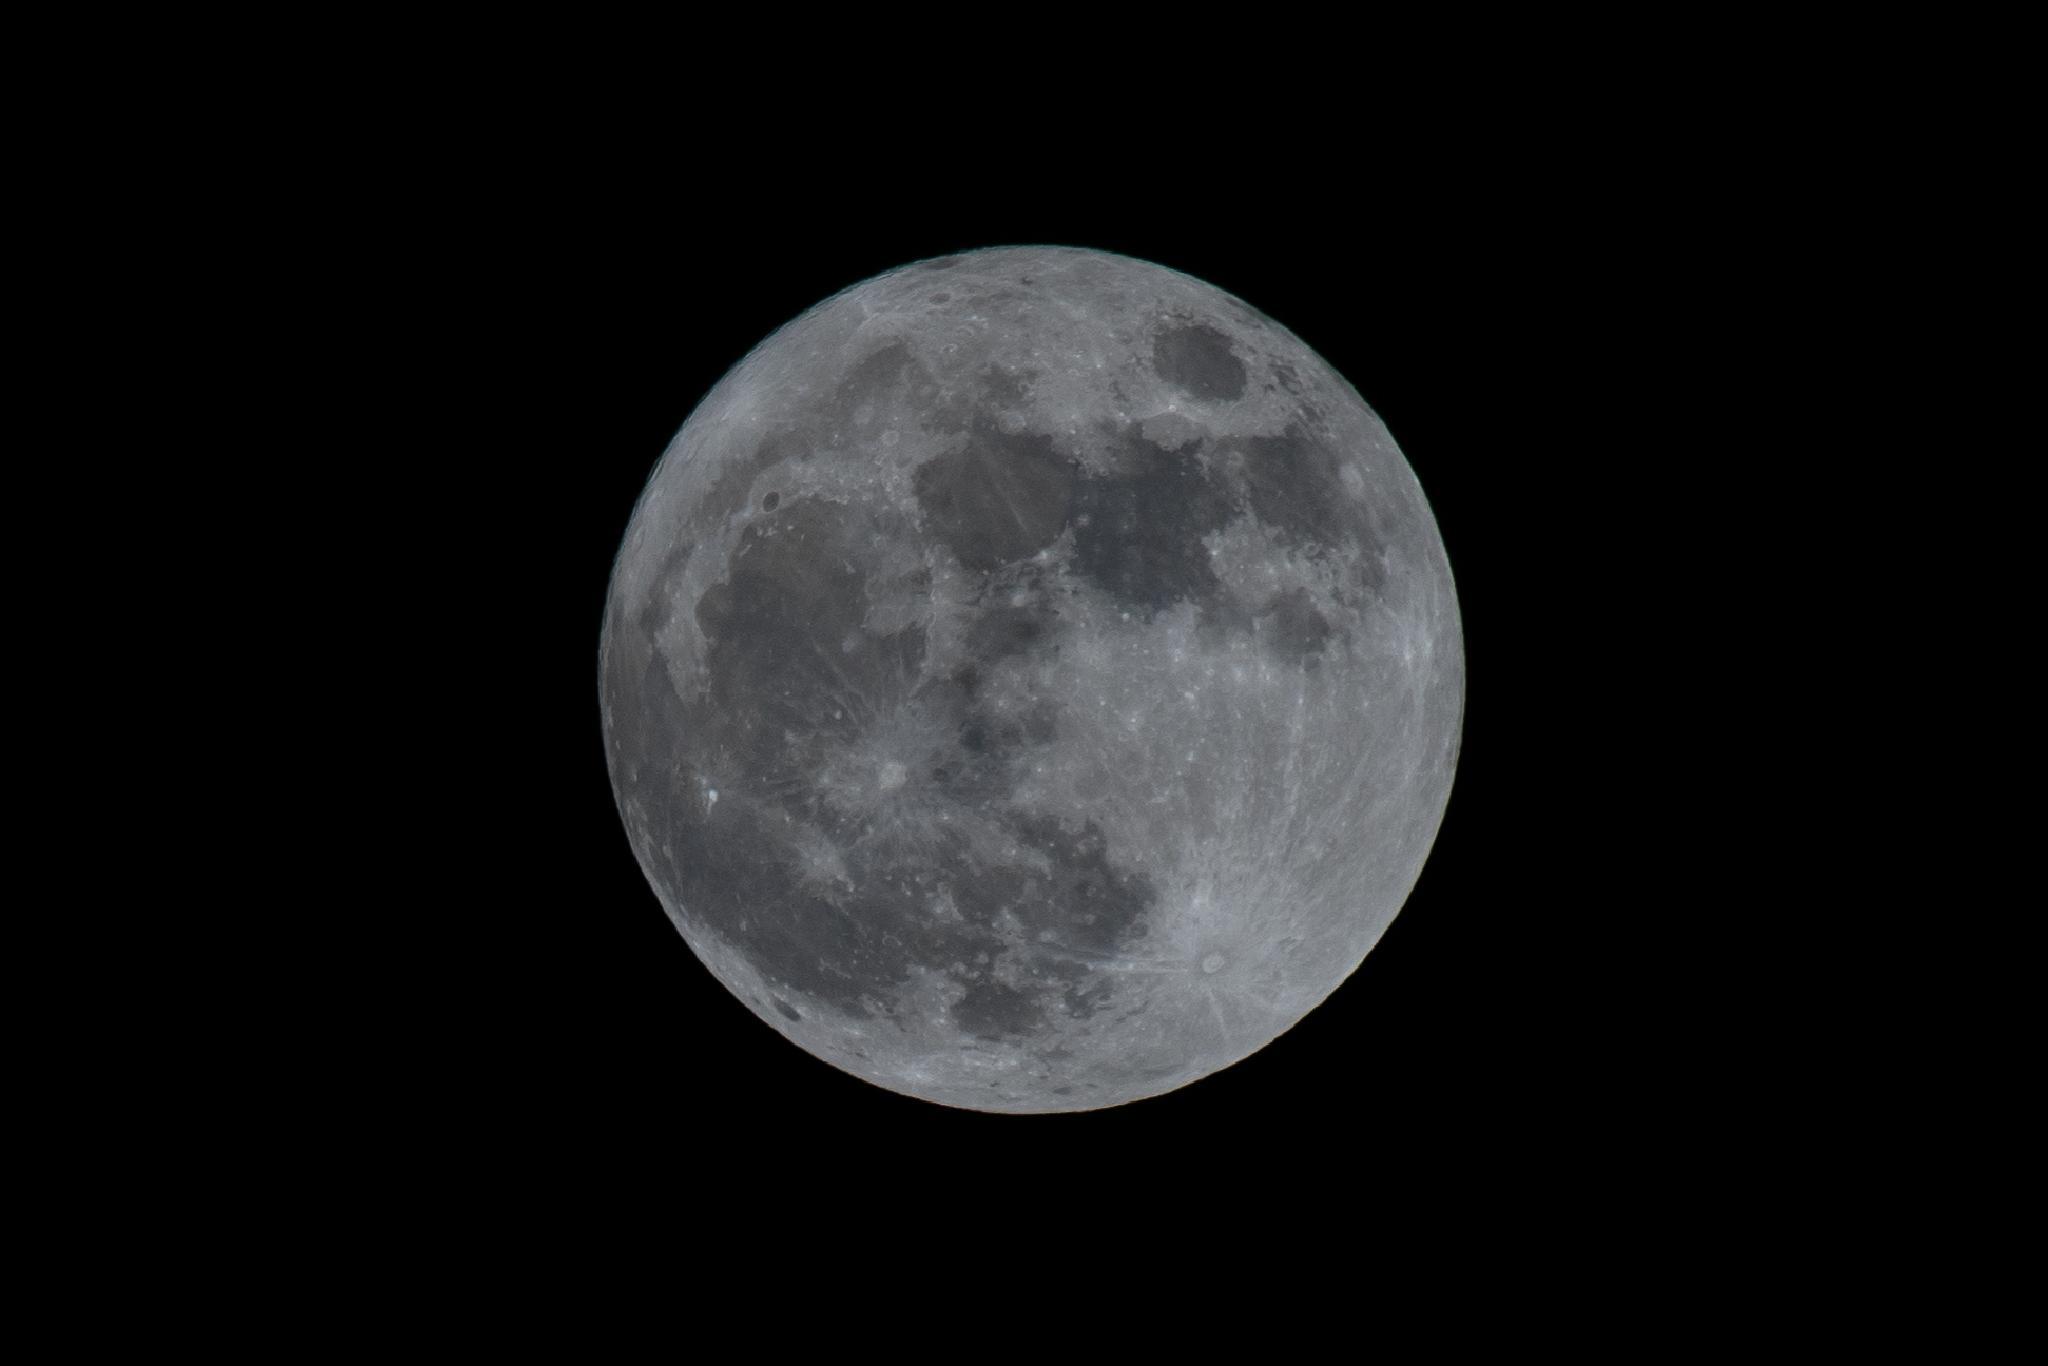 Full Moon by DarrenWood